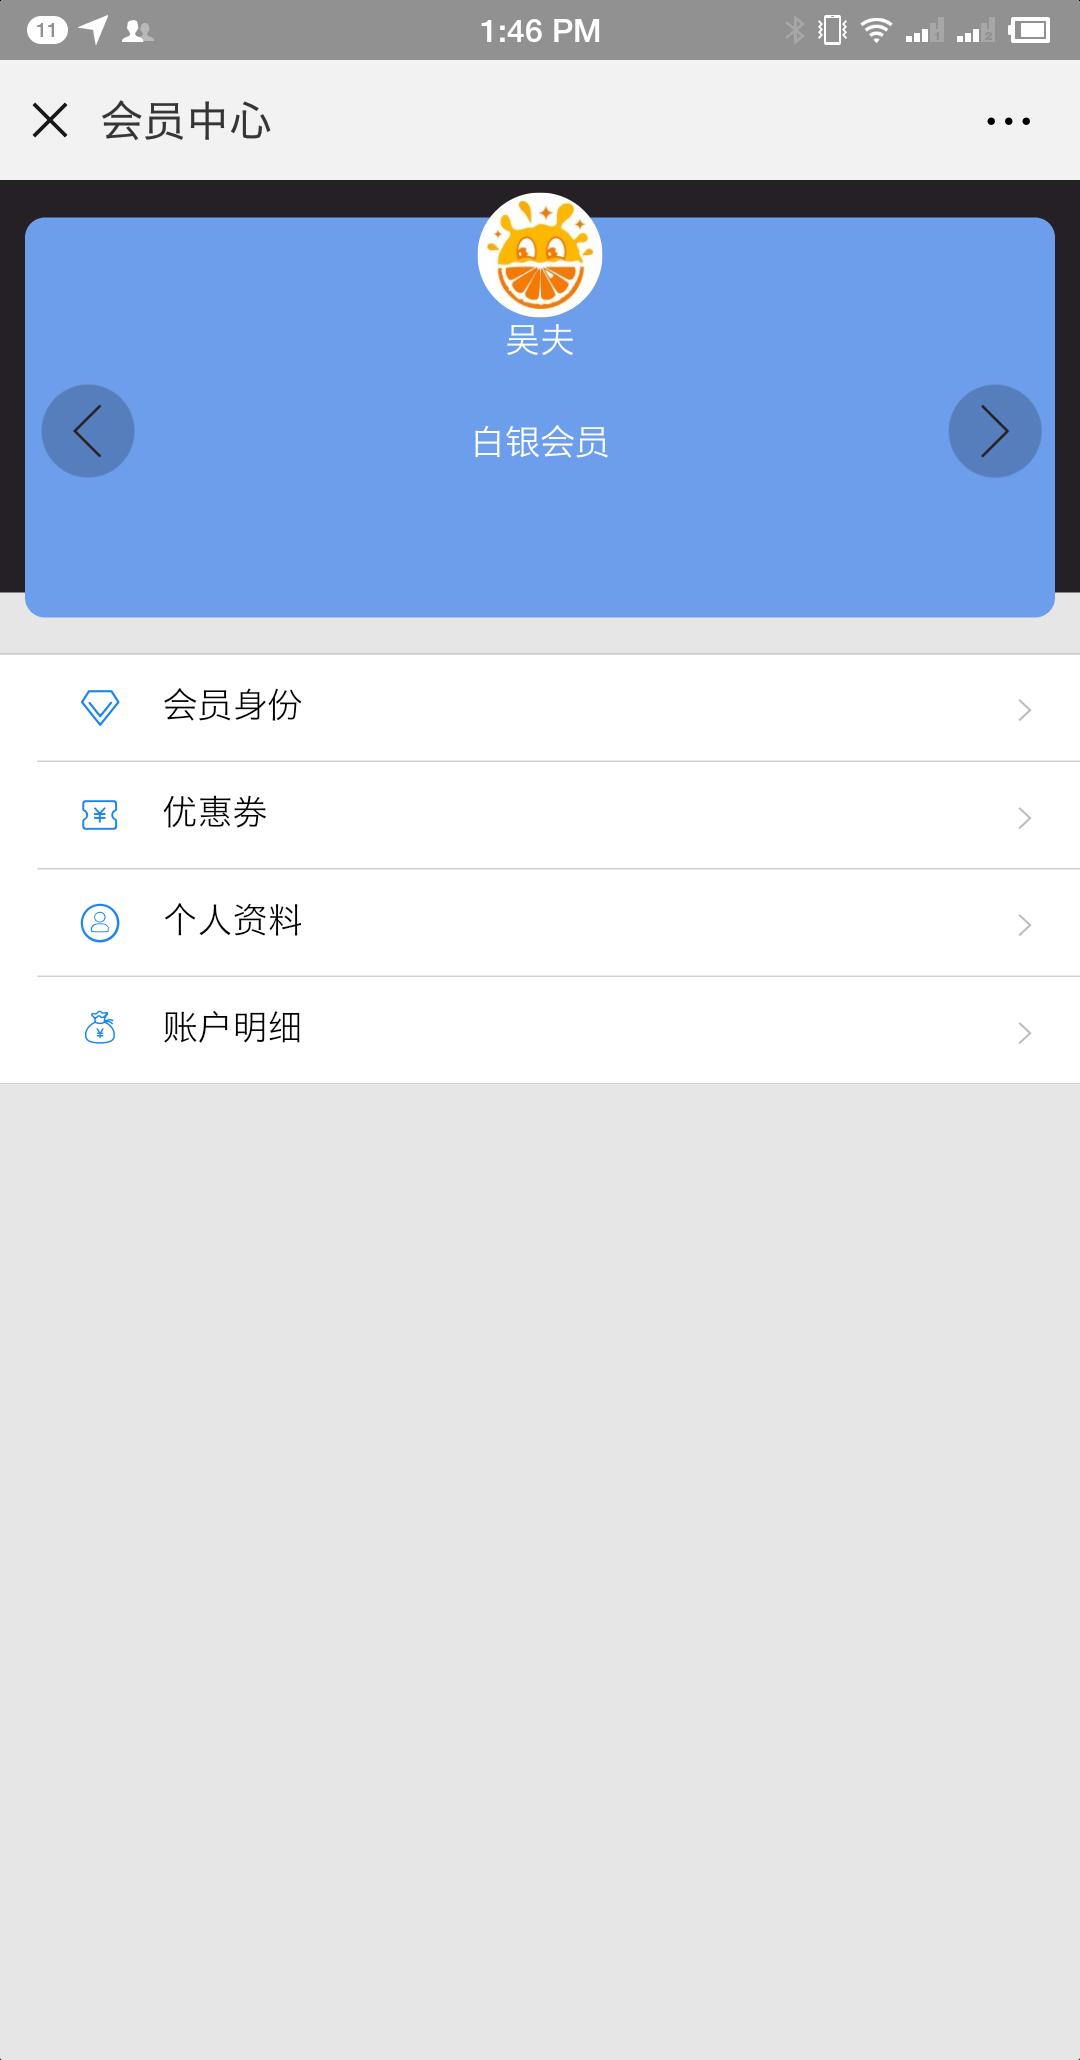 【脐橙】会员navlange_member 1.59.0版本